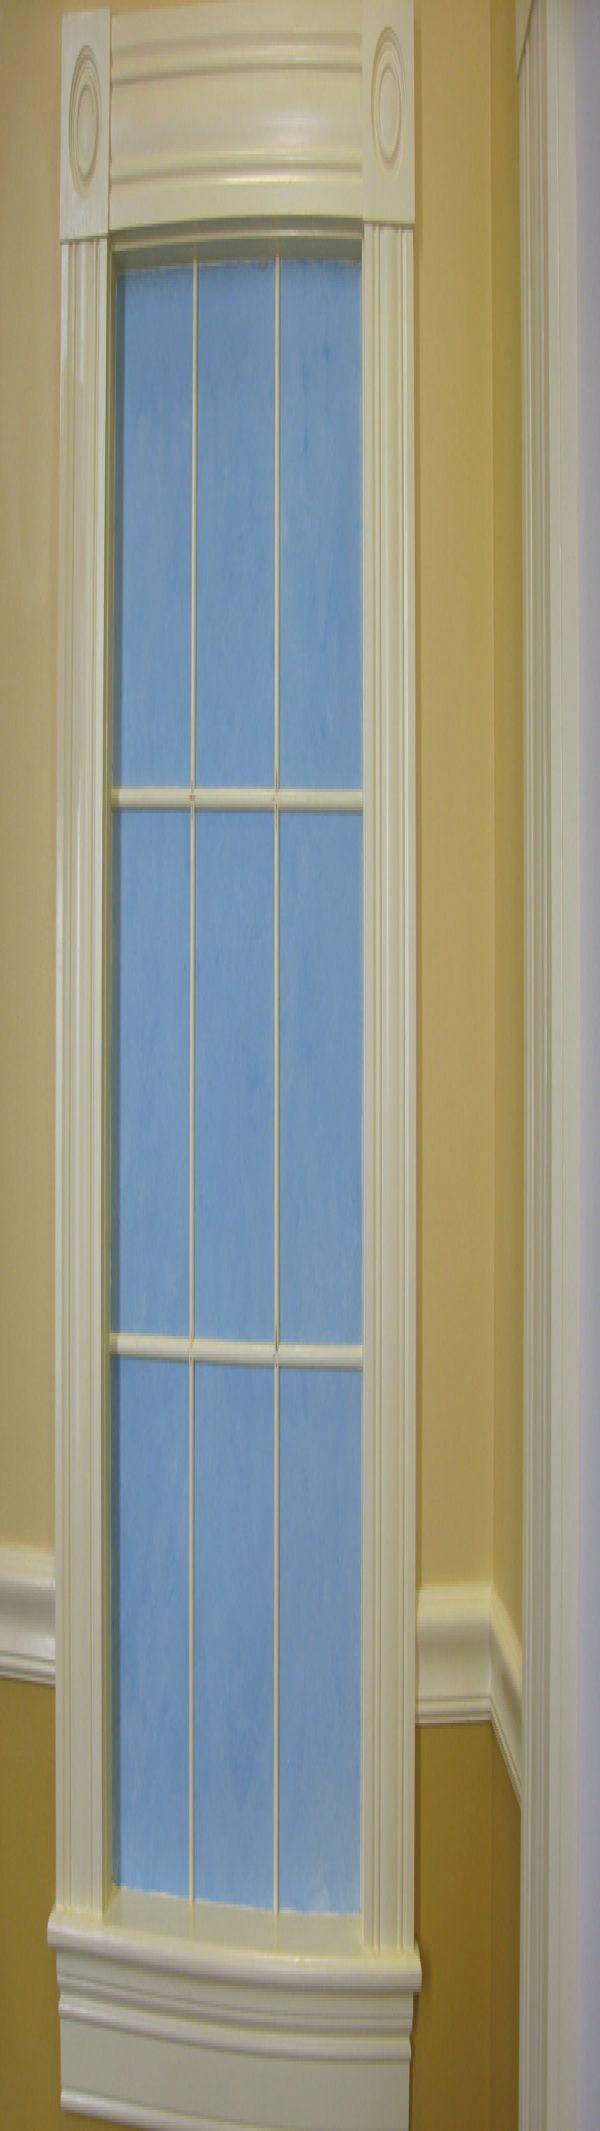 Interior Window Trim | New Trim Interior With New Window